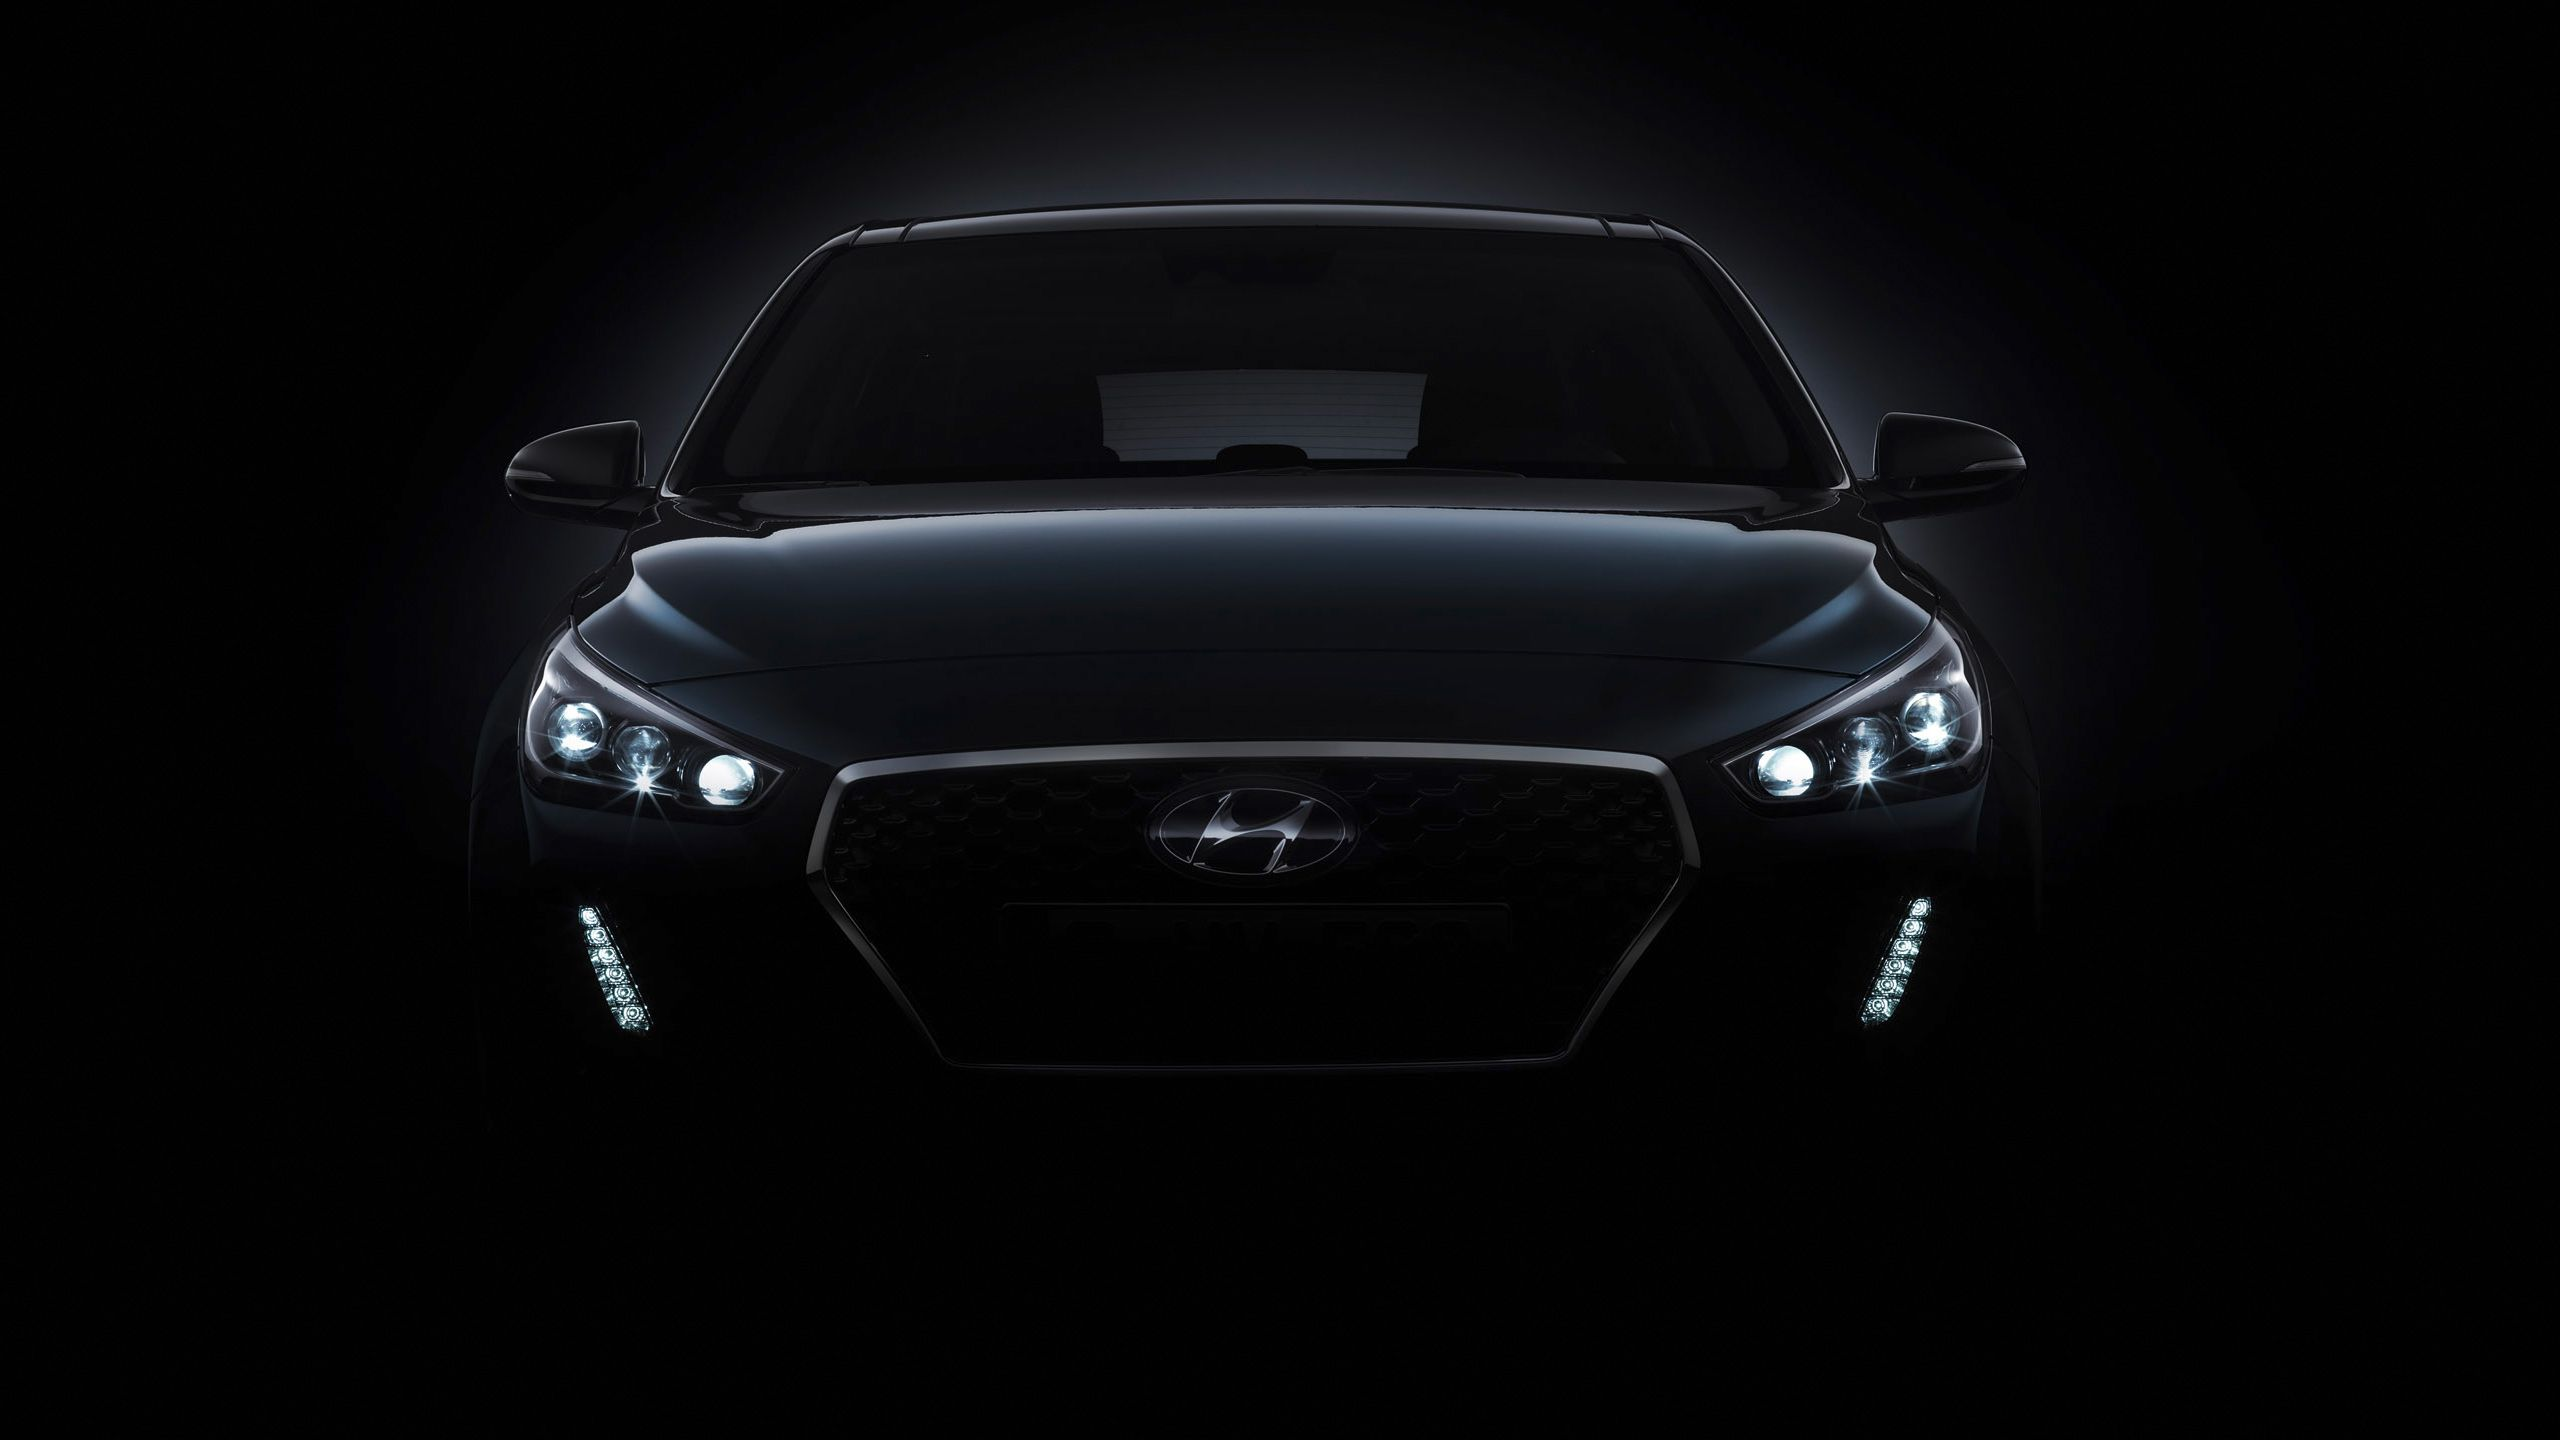 Hyundai 4k Wallpapers Top Free Hyundai 4k Backgrounds Wallpaperaccess